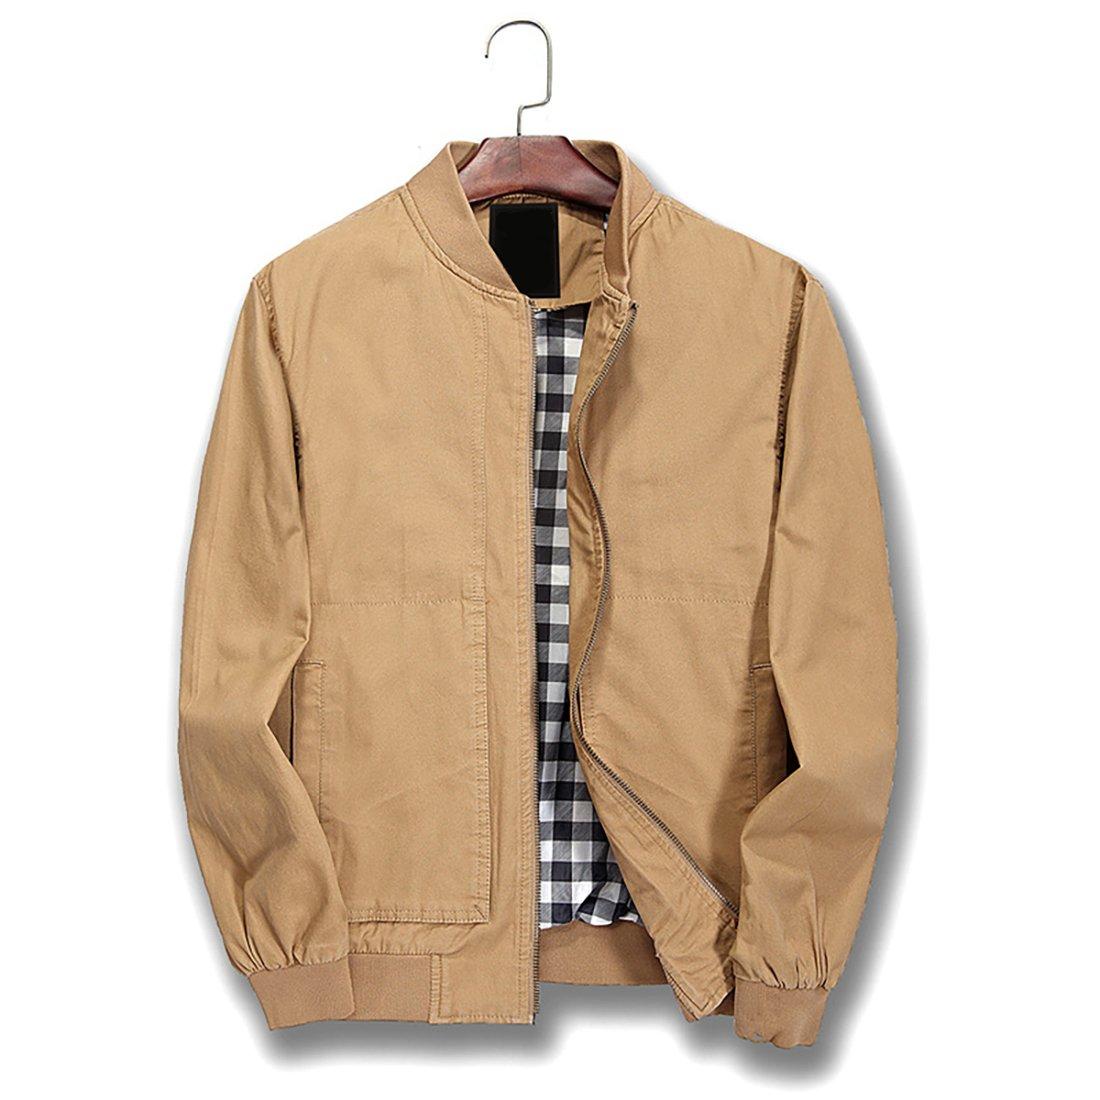 Nantersan Mens Bomber Jacket Cotton Softshell Sportswear Lightweight Slim Jacket Coat by Nantersan